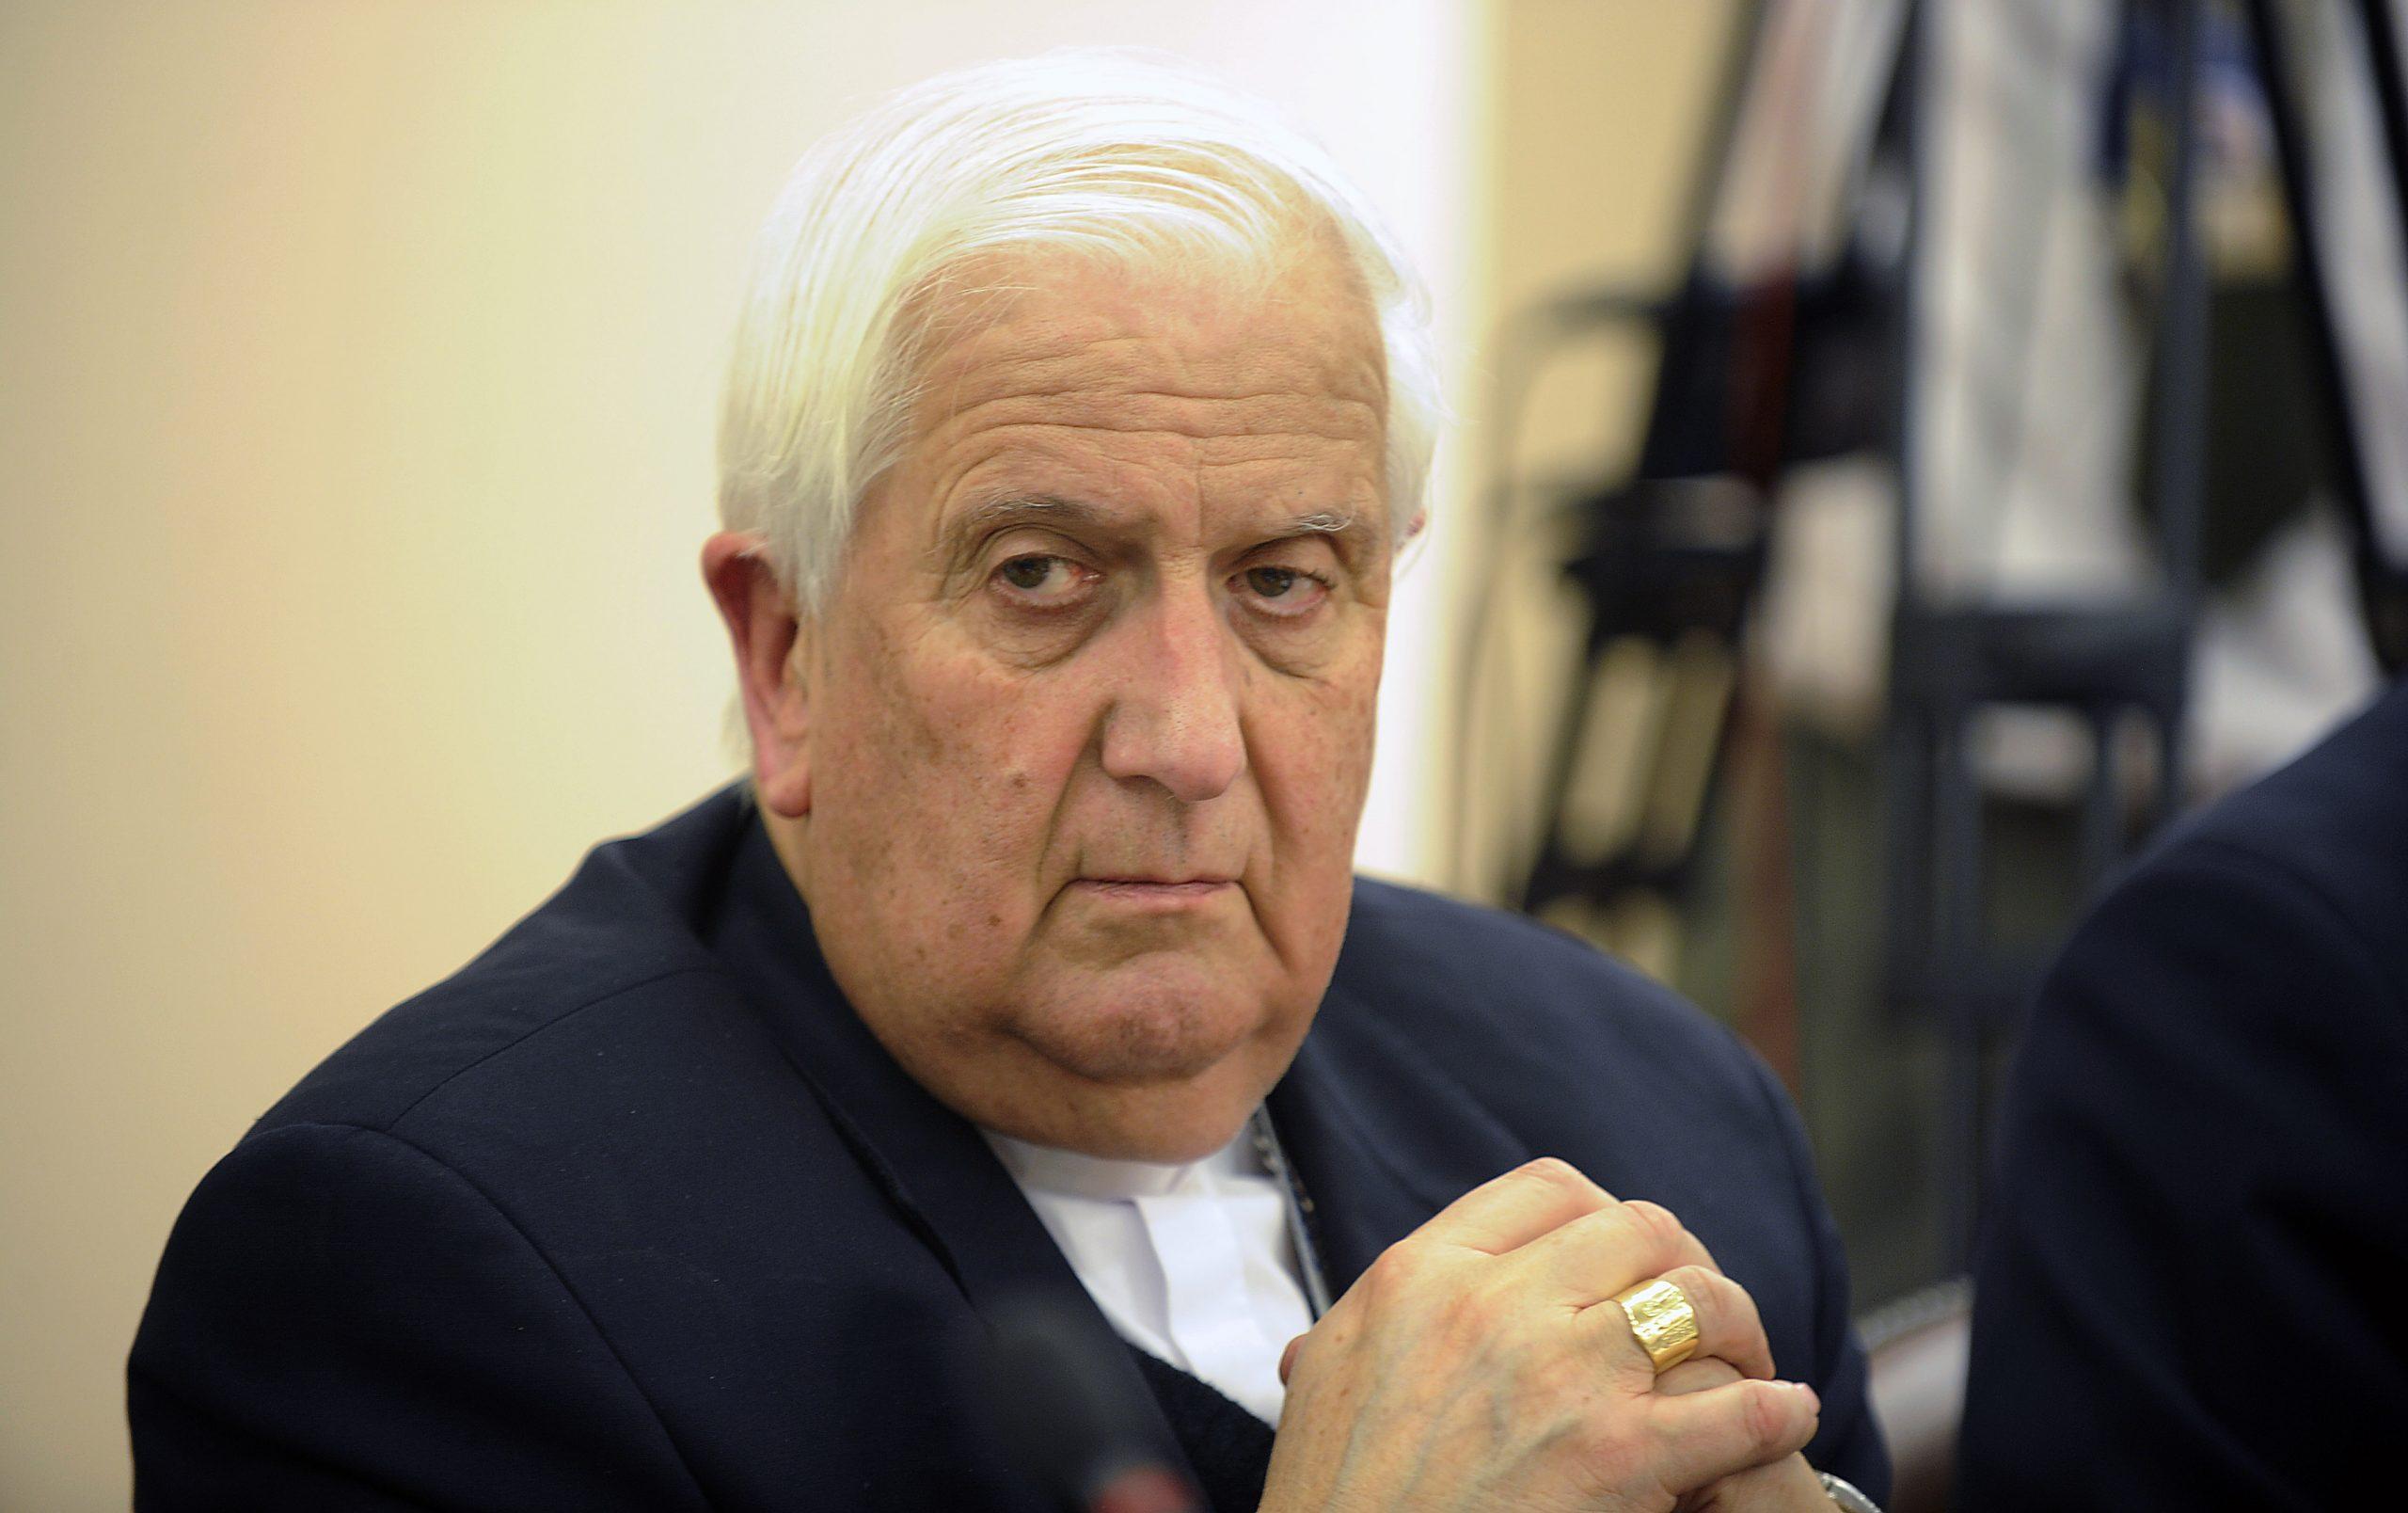 Historia de Chile: Los errores de un obispo